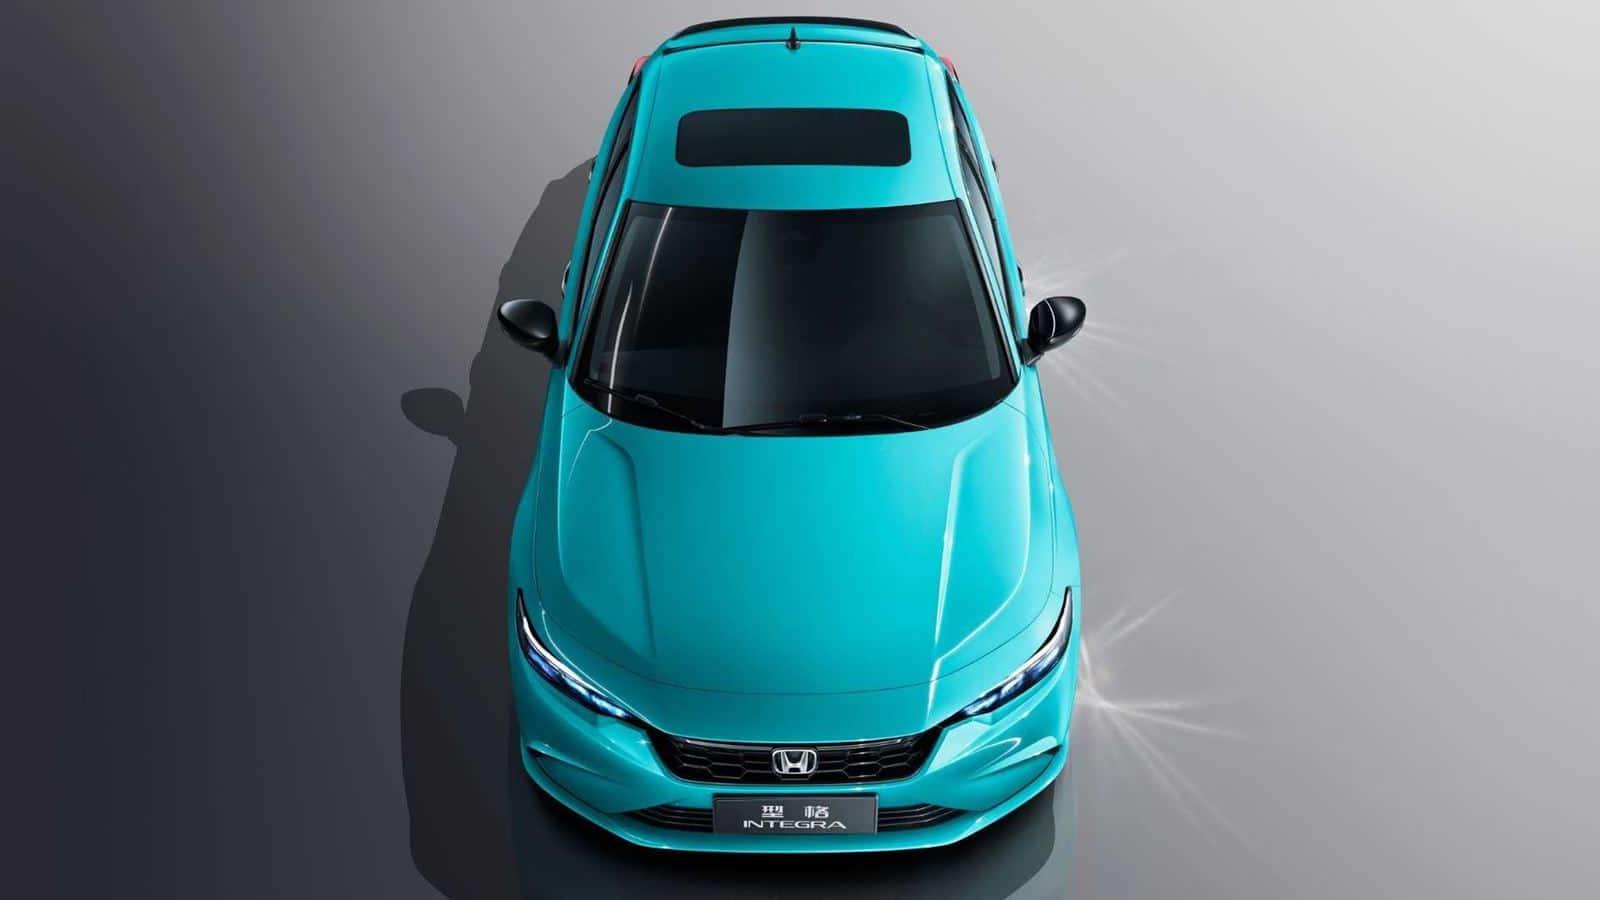 Honda Integra azul